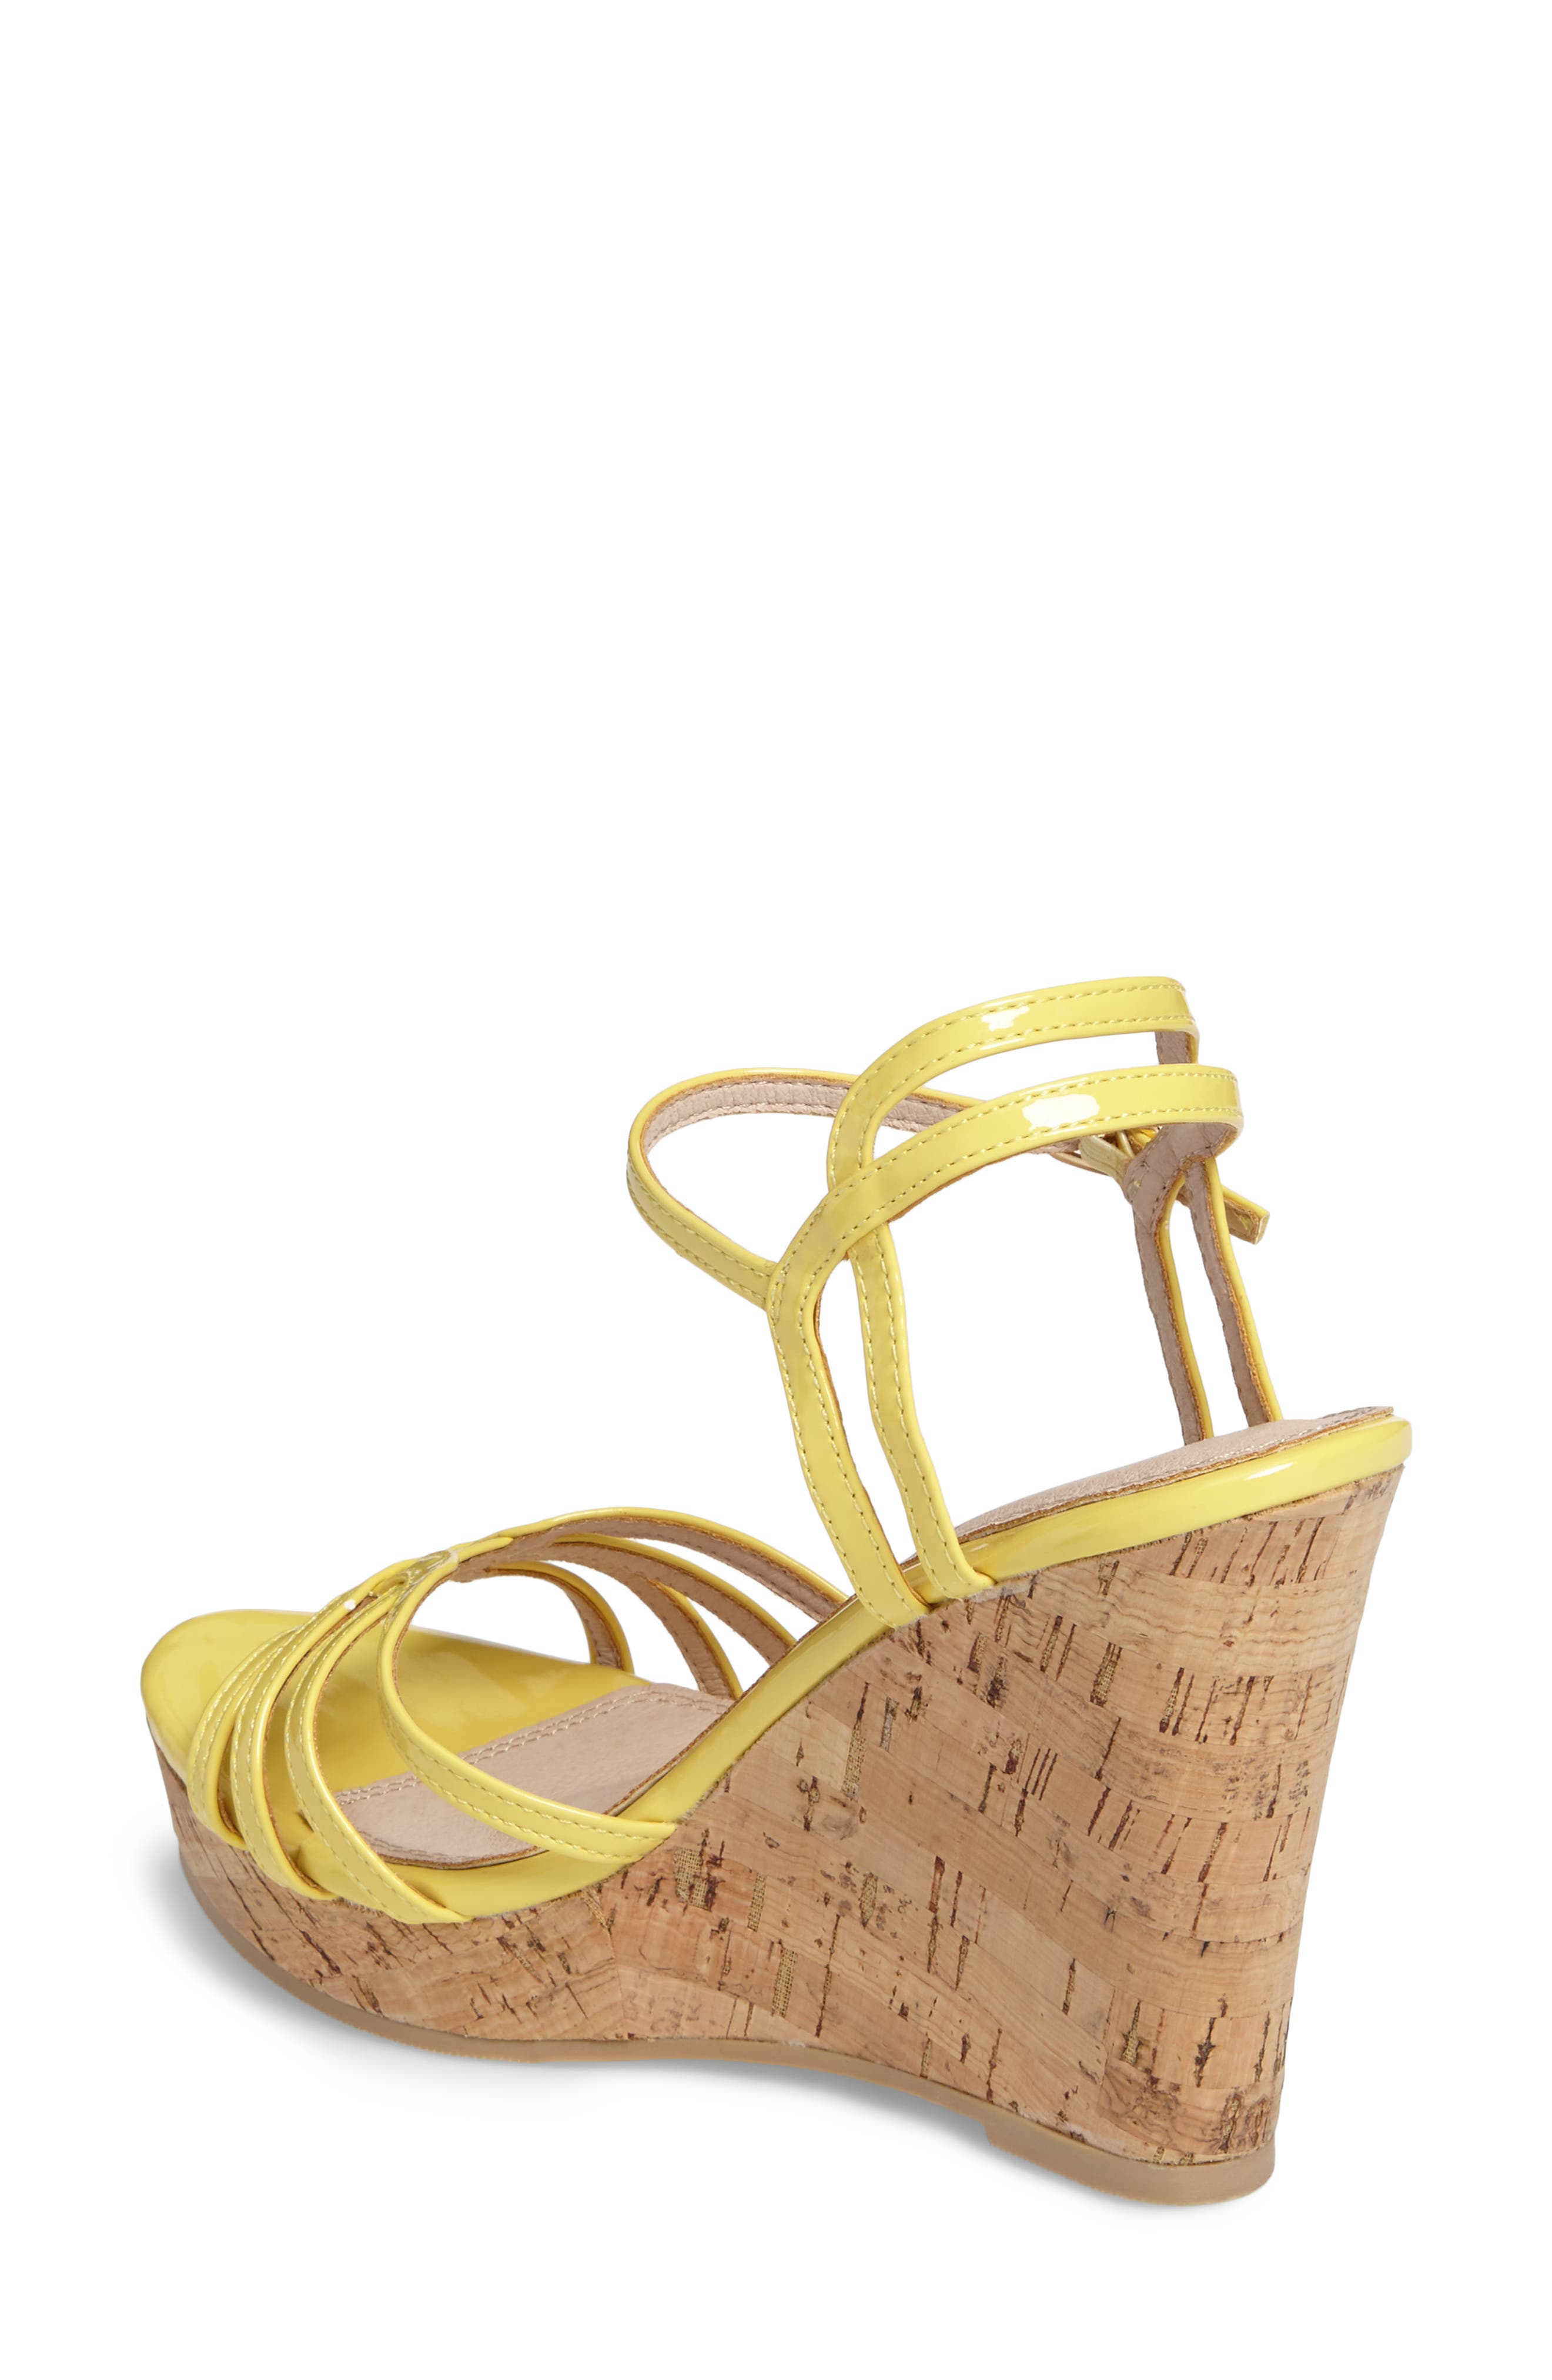 Oasis Platform Wedge Sandal,                             Alternate thumbnail 2, color,                             Yellow Synthetic